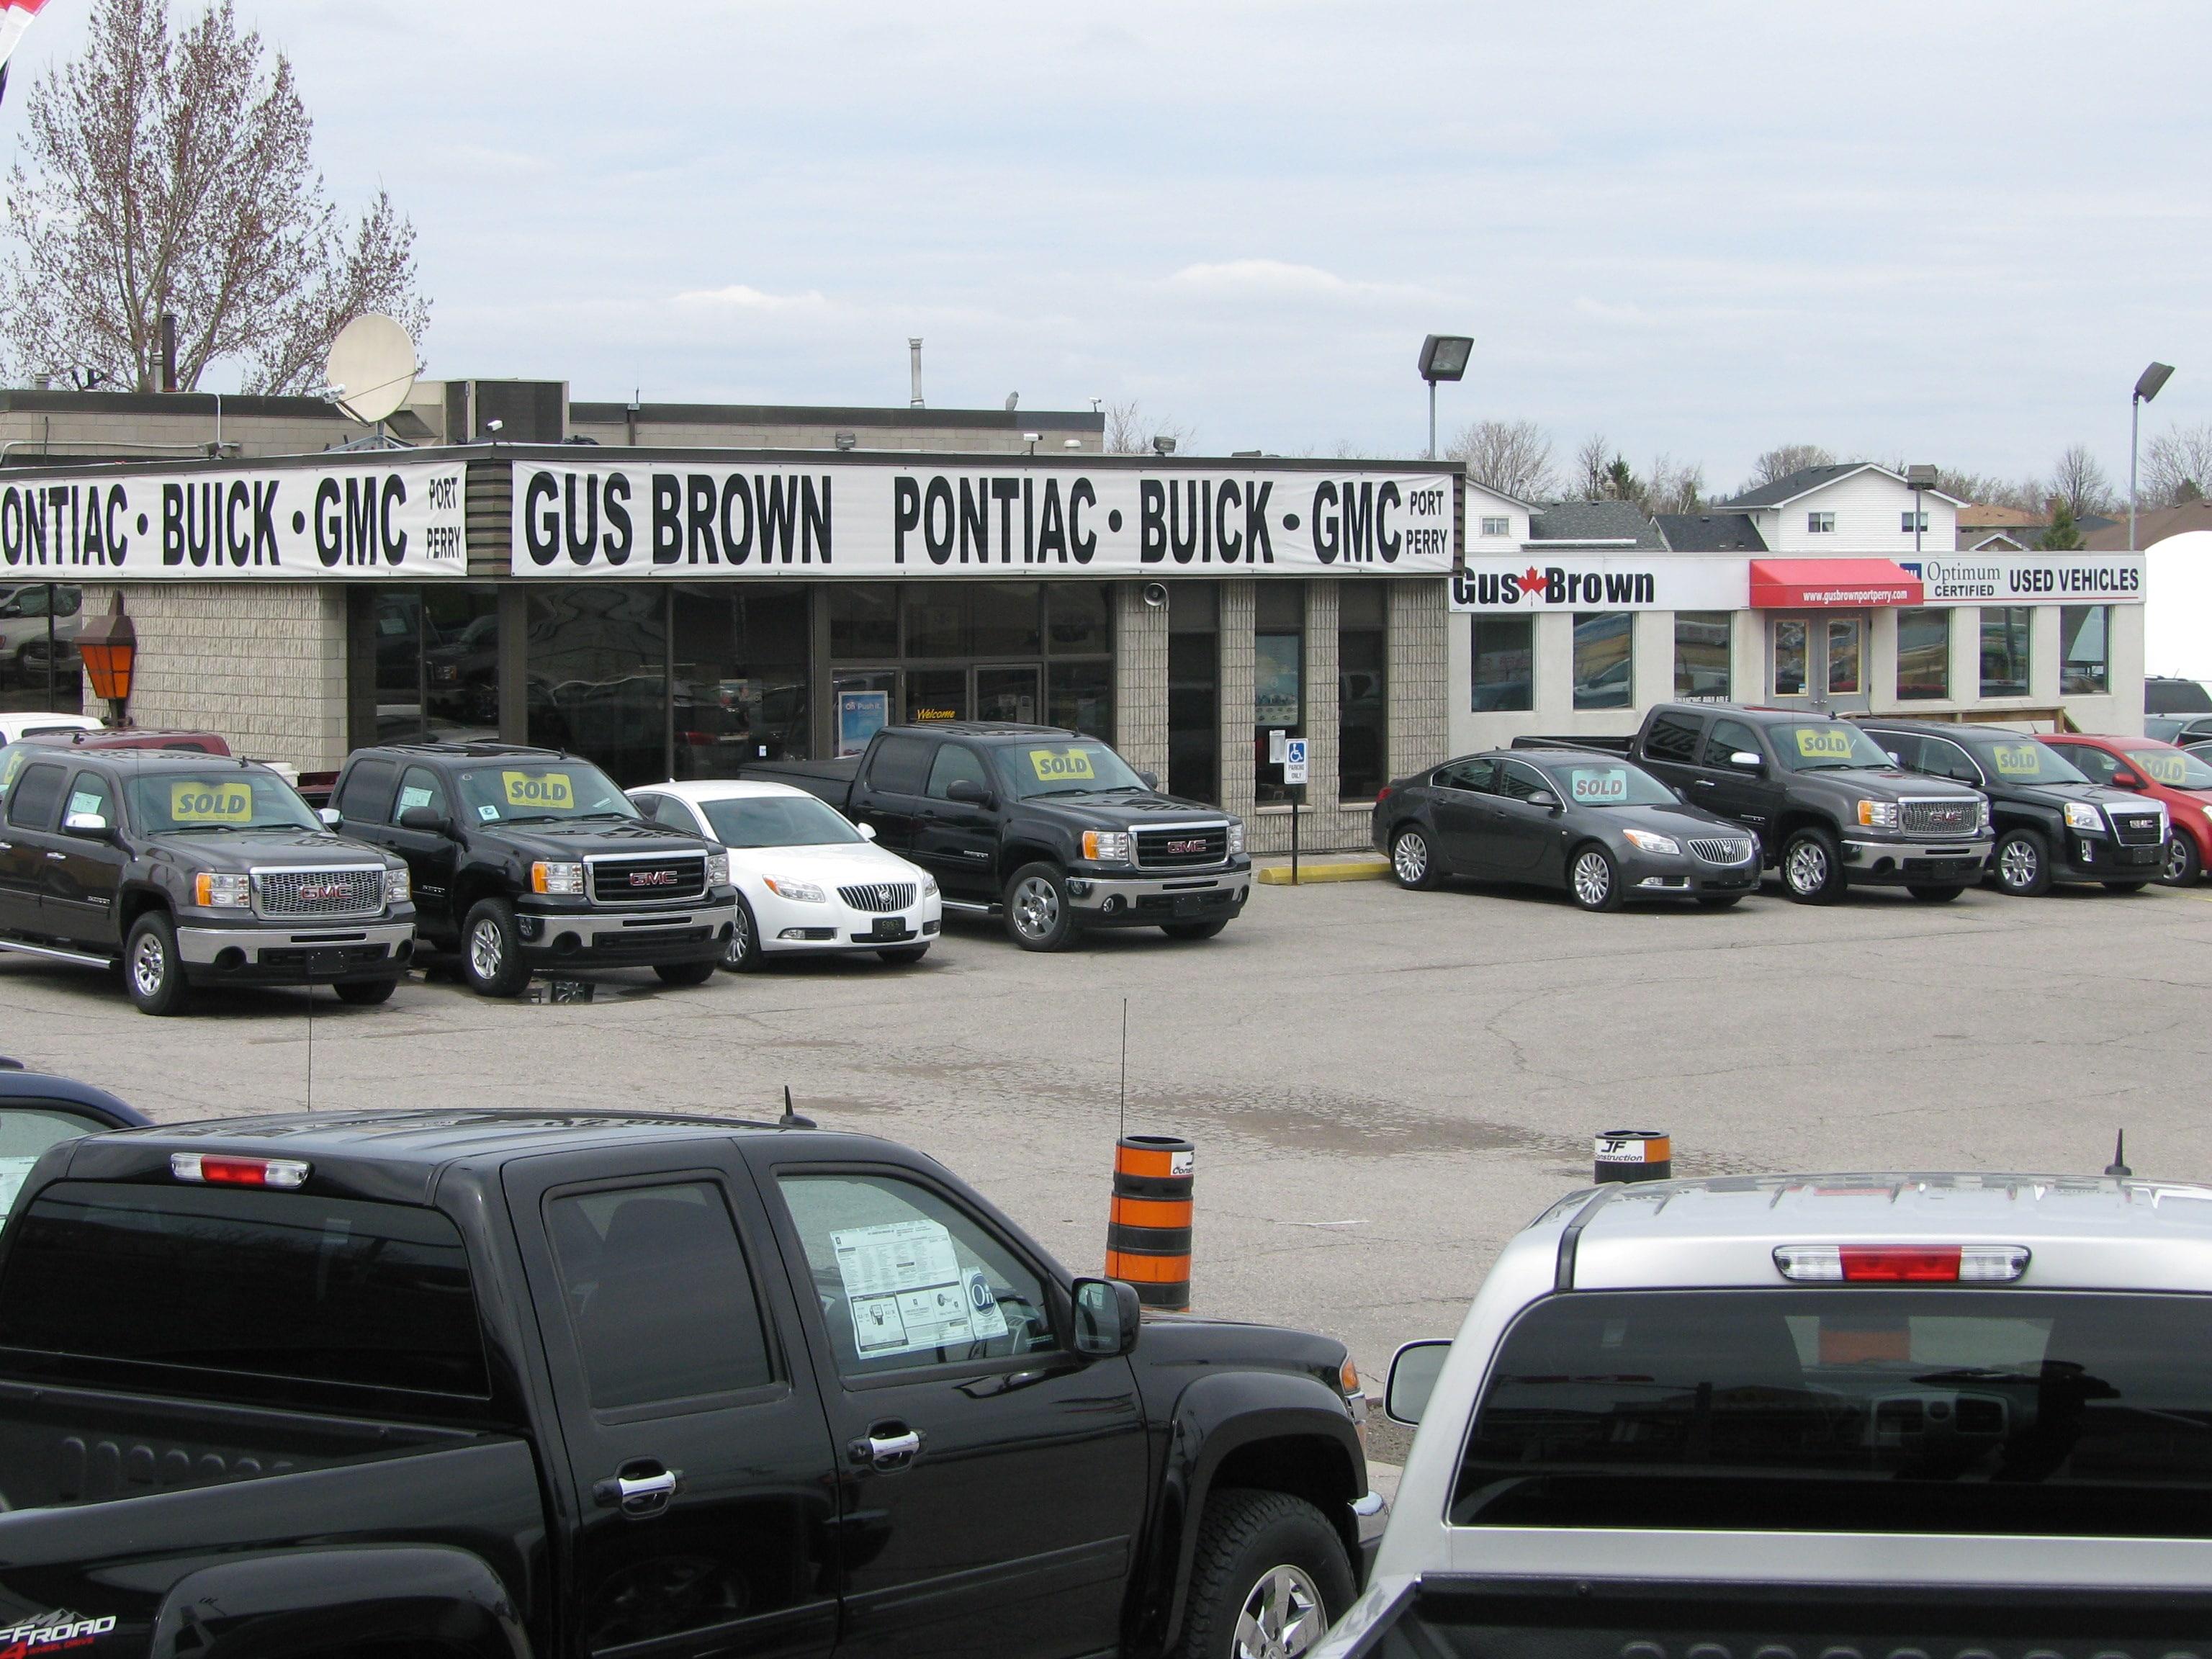 Gus Brown Pontiac Buick GMC